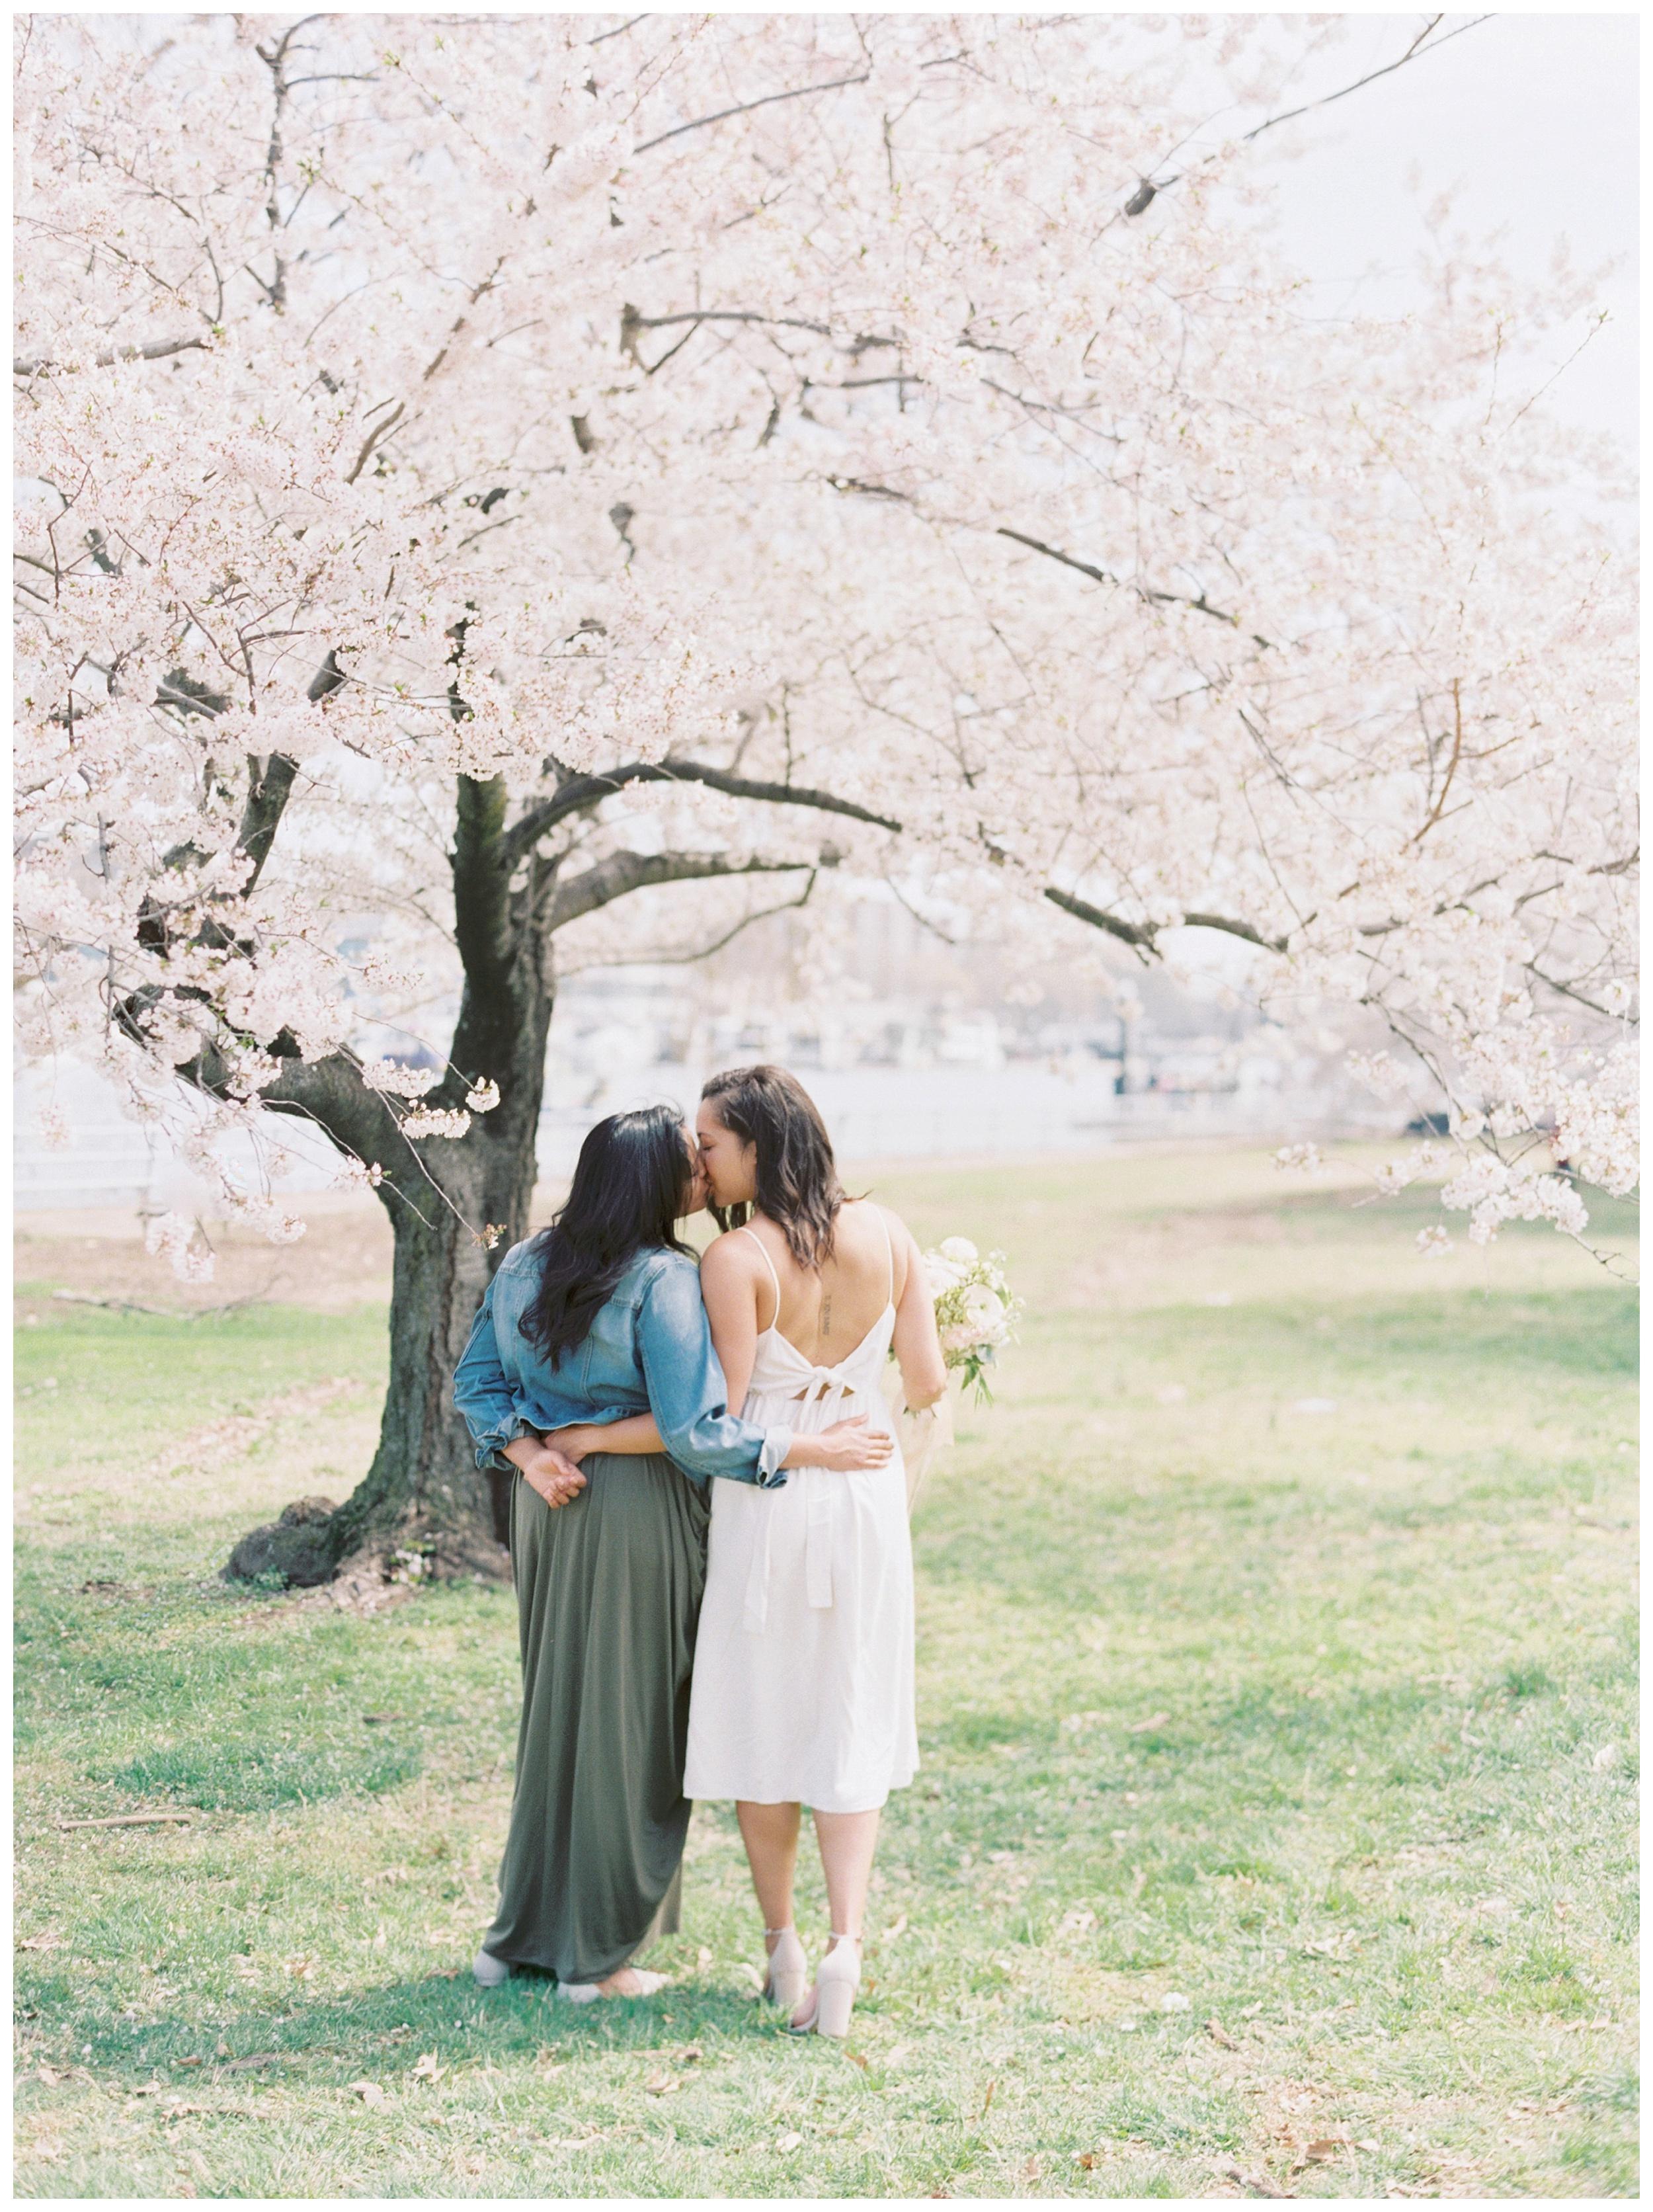 Same Sex DC Engagement | District of Columbia Cherry Blossom Engagement Kir Tuben_0026.jpg